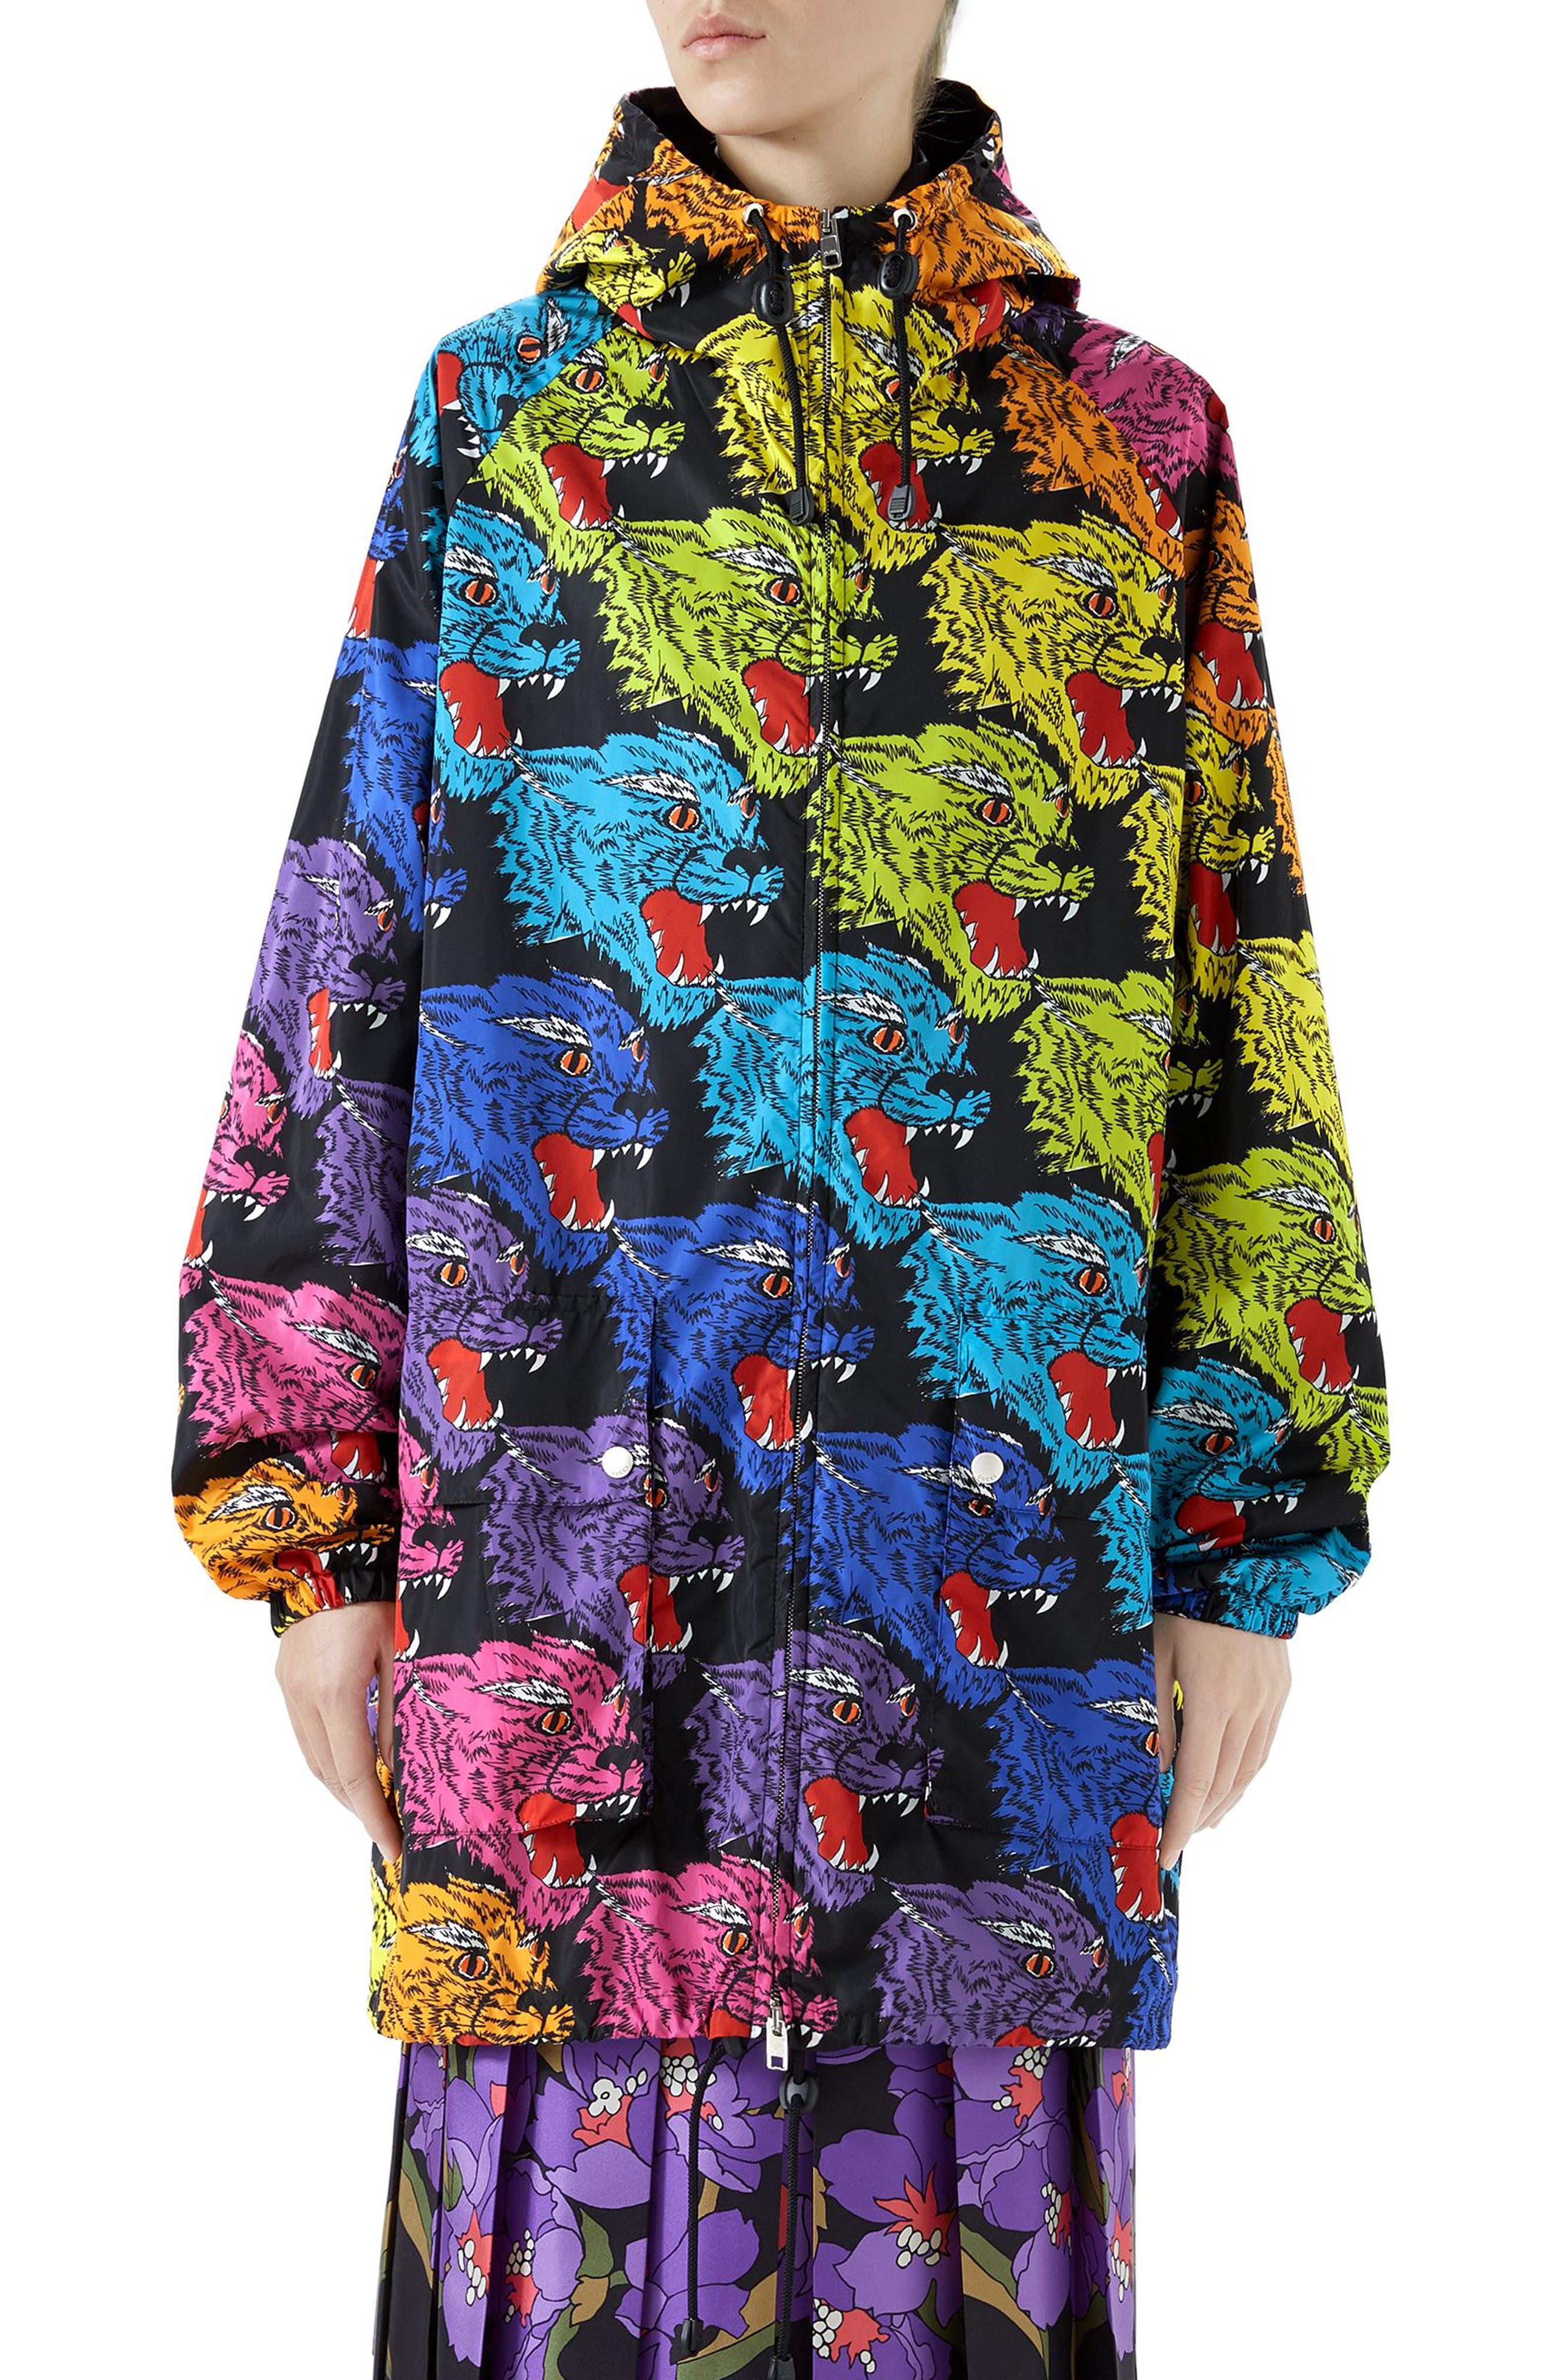 Rainbow Panther Hooded Jacket,                             Main thumbnail 1, color,                             RAINBOW PRINT